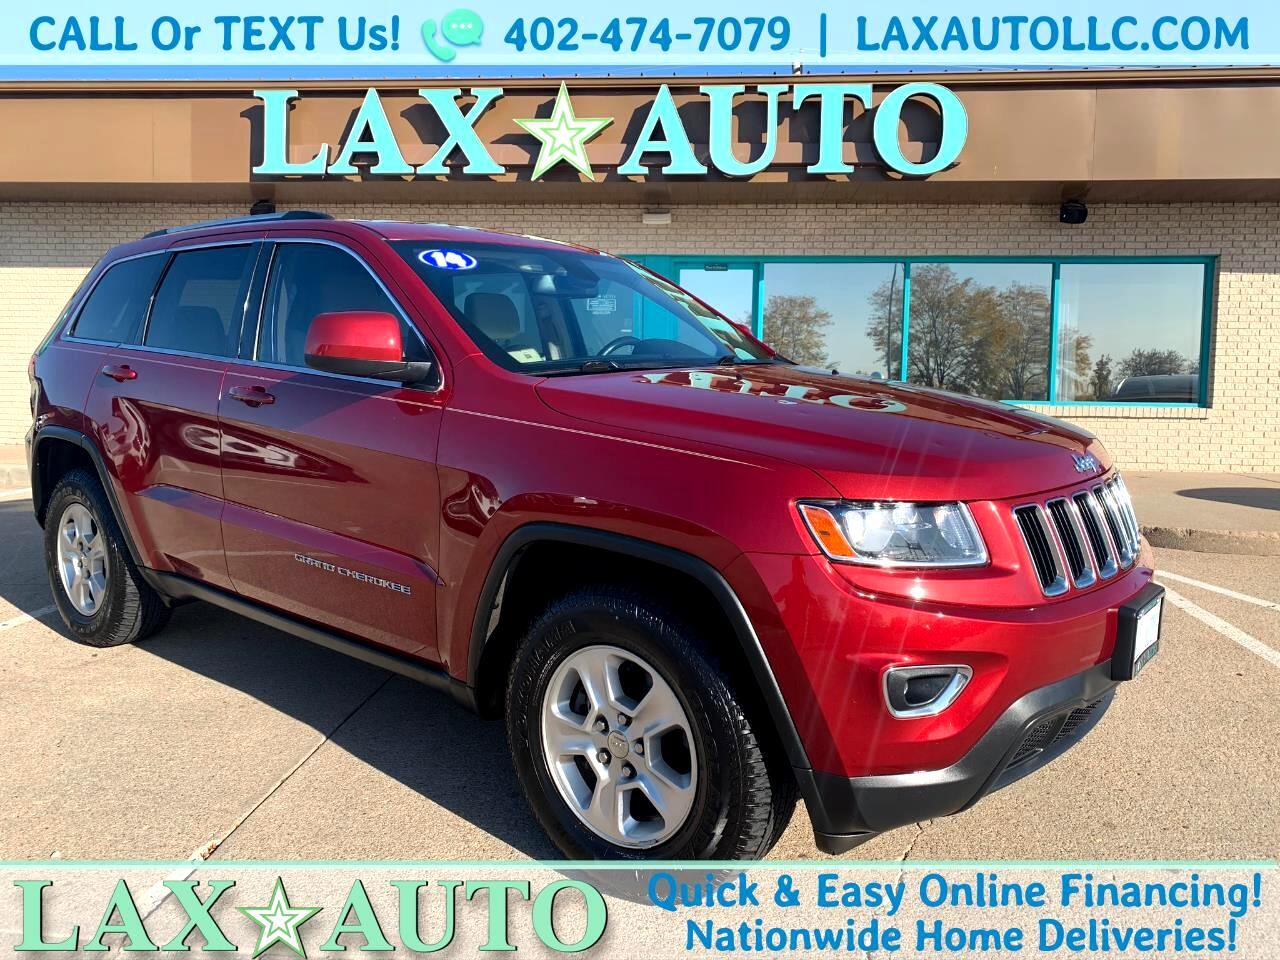 2014 Jeep Grand Cherokee Laredo 4WD * 91K Miles